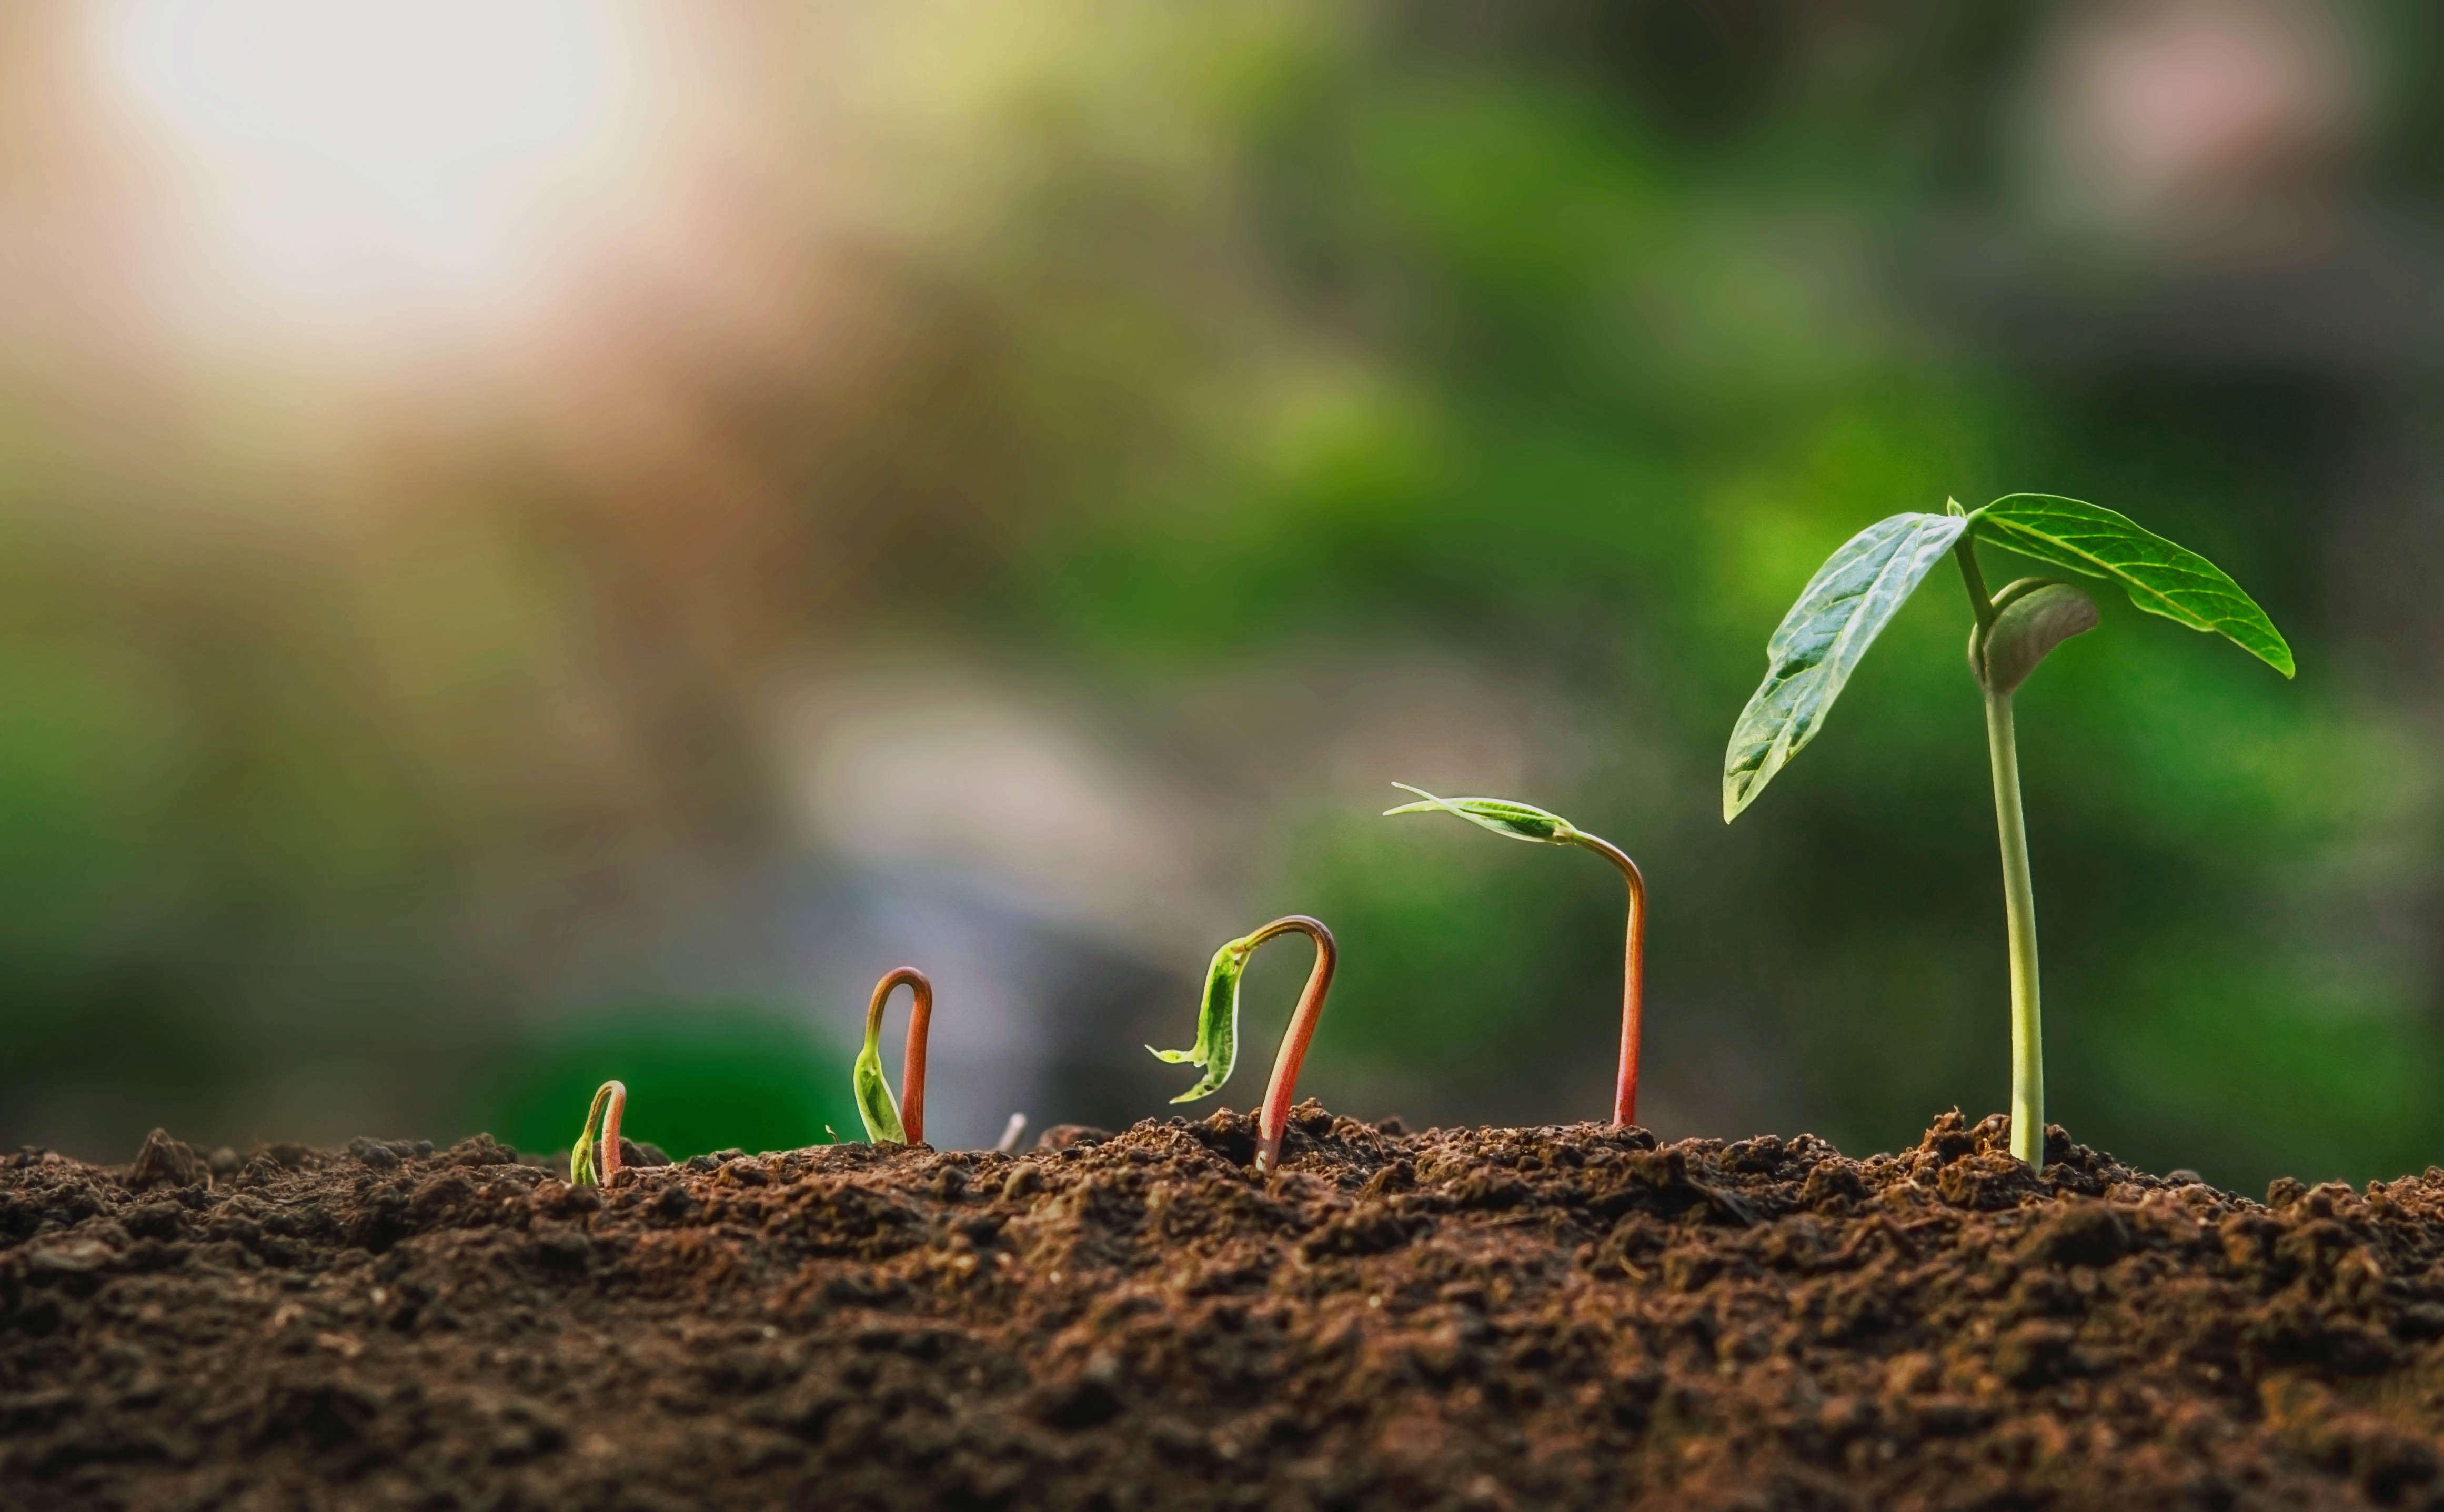 Bios Grow